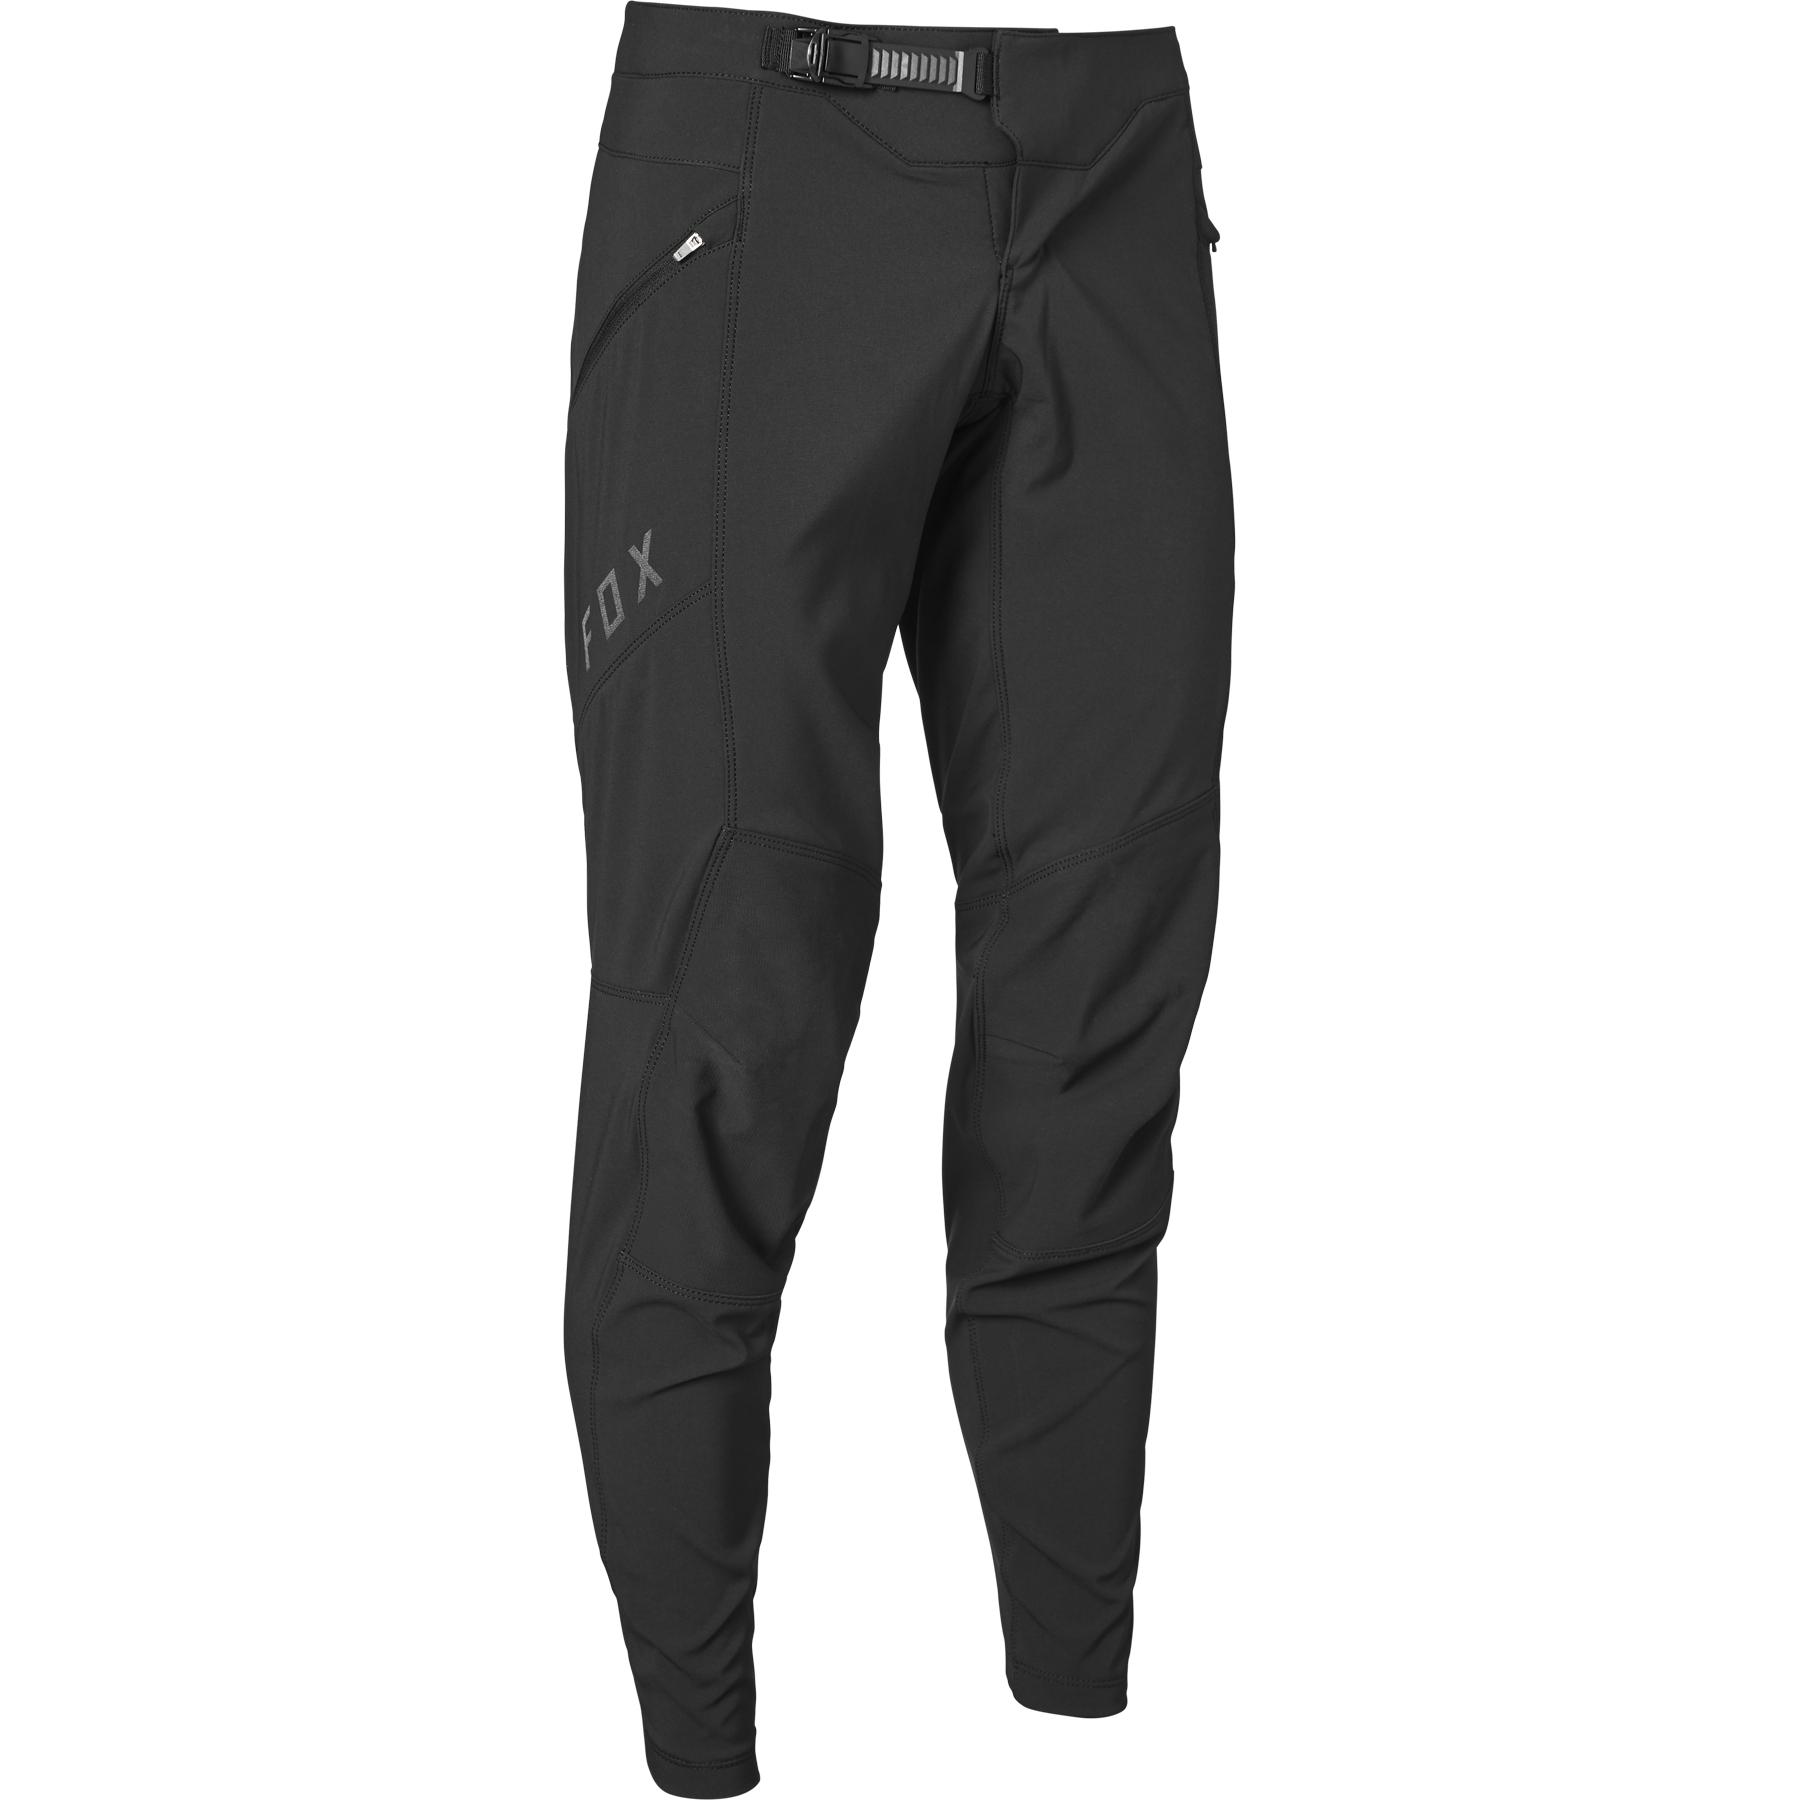 FOX Defend Fire MTB Pantalon - black